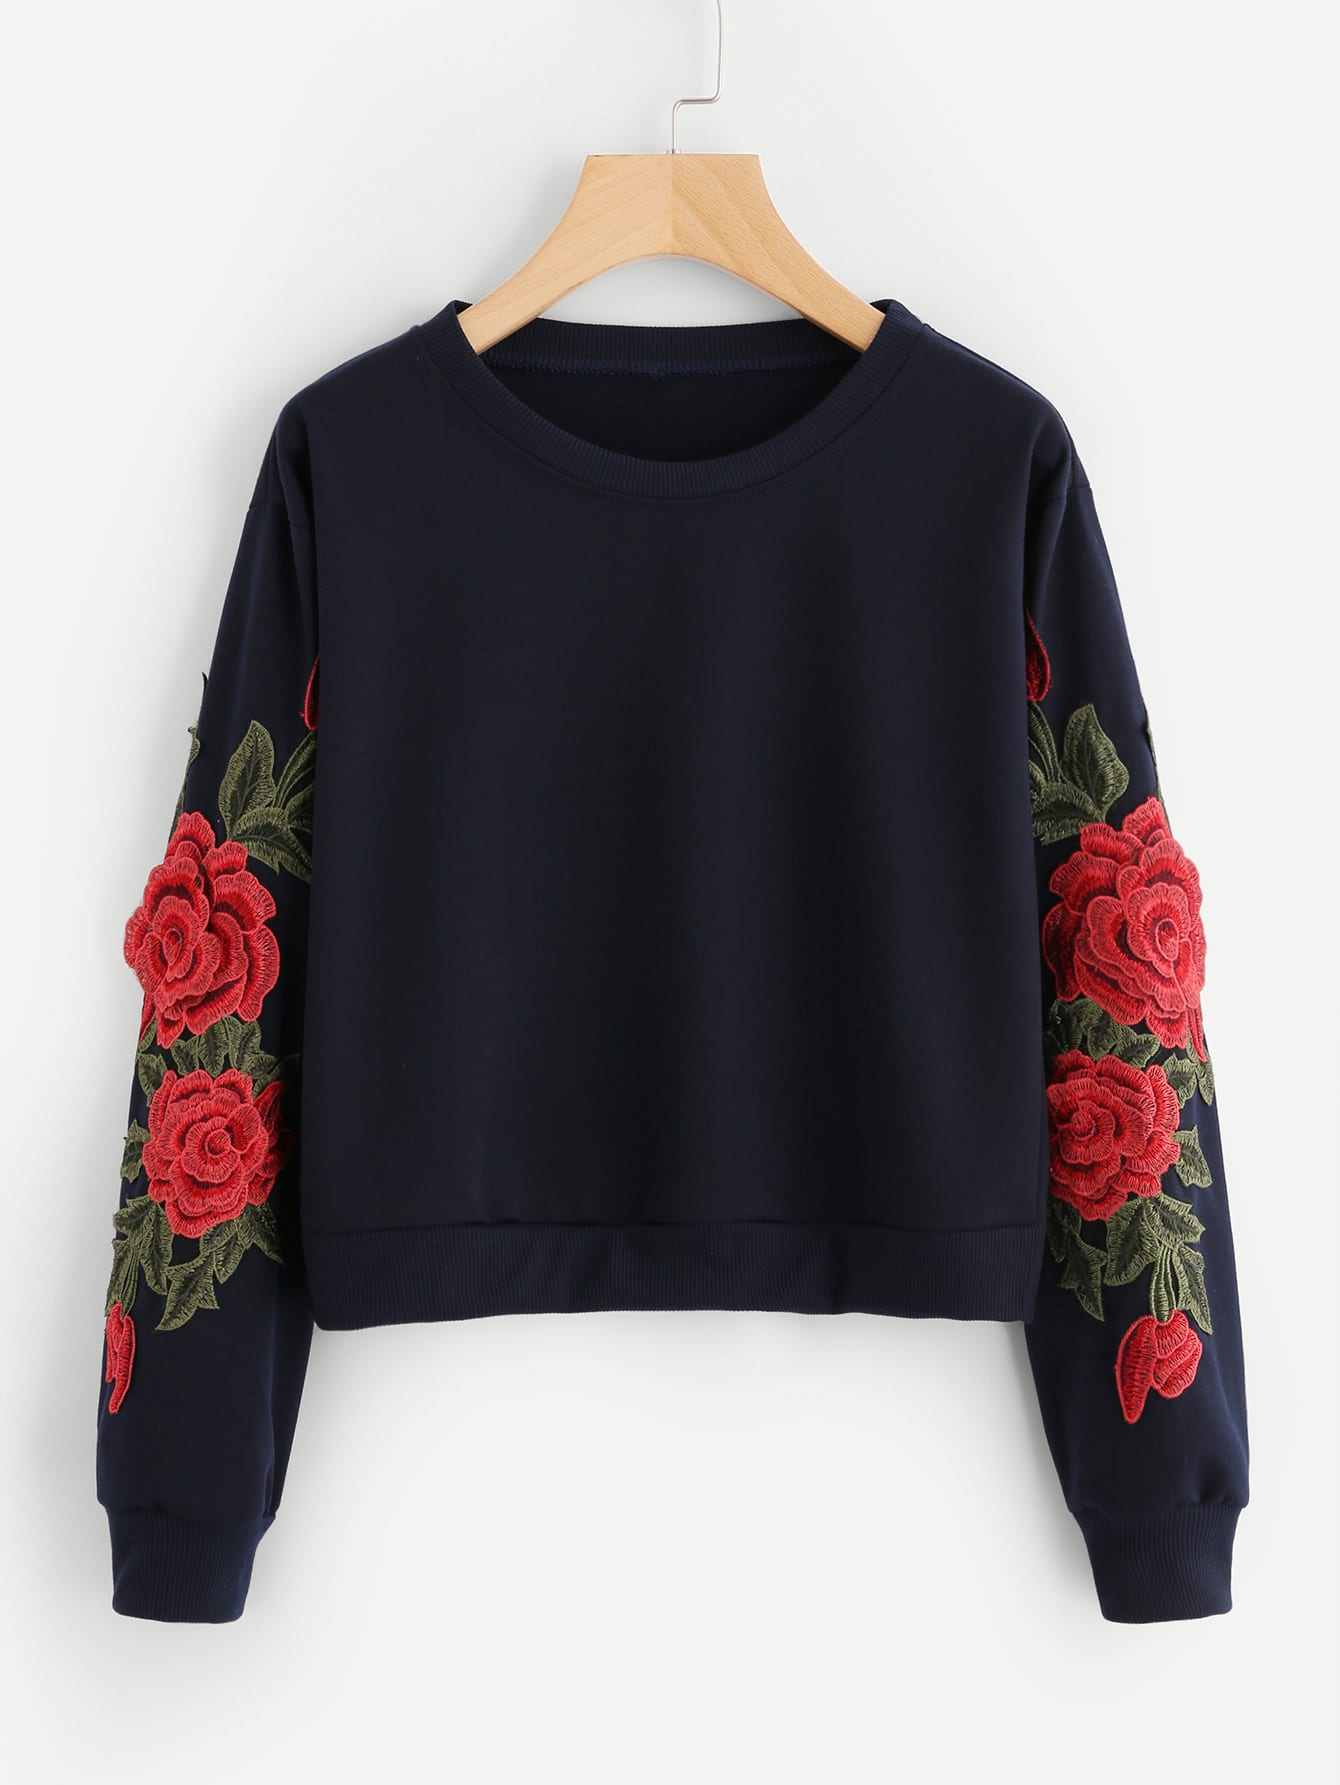 Rose Embroidered Applique Sleeve Sweatshirt rose embroidered applique sleeve sweatshirt